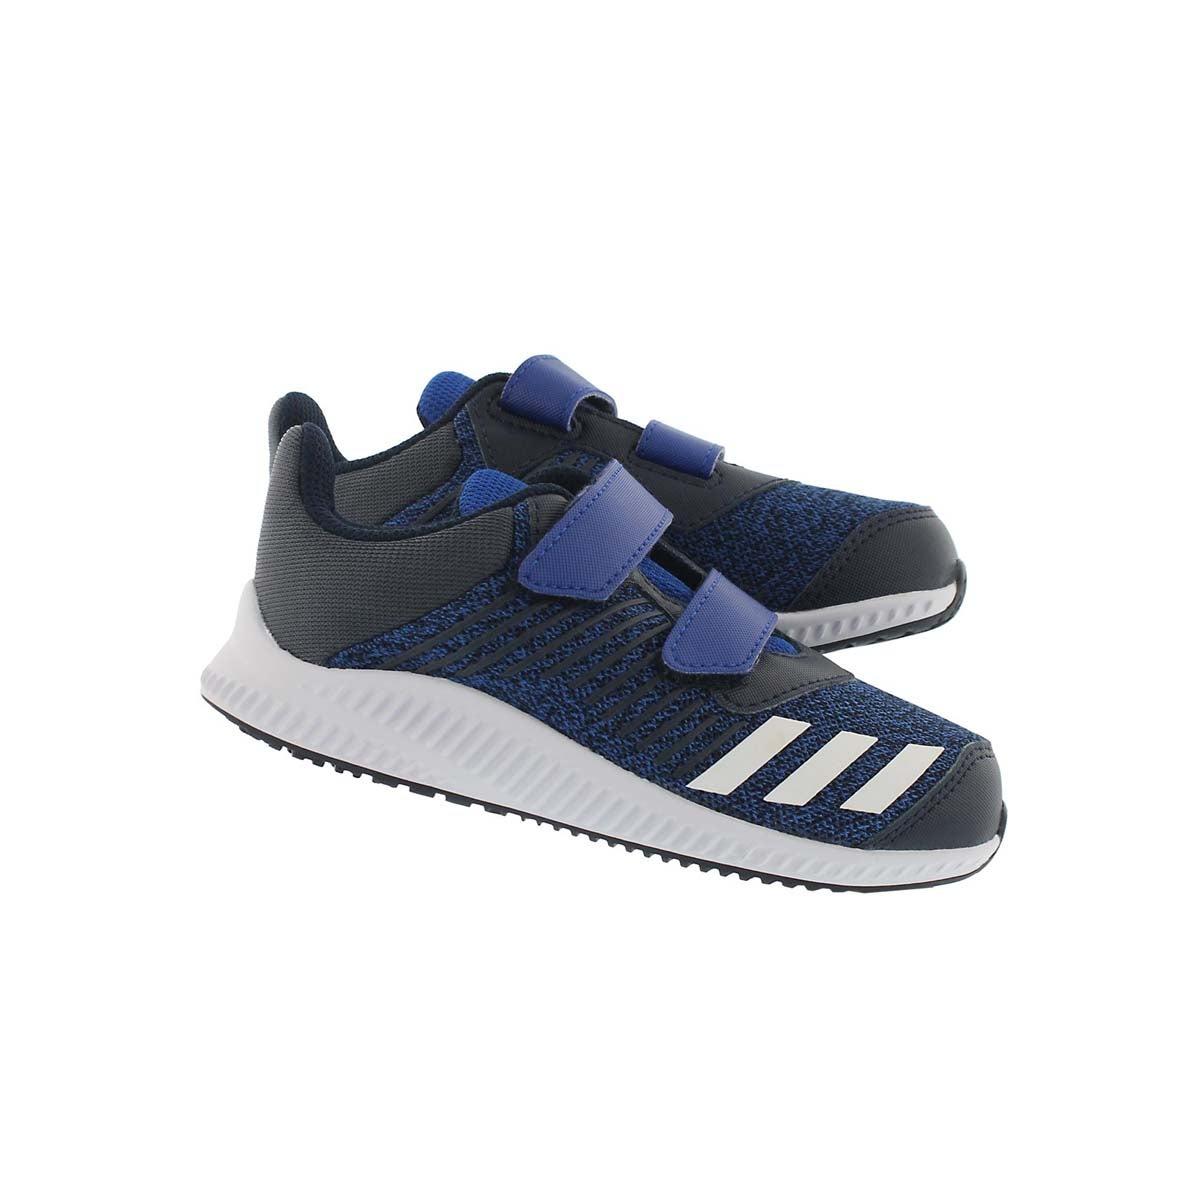 Infs-b FortaRun CF nvy/wht sneaker